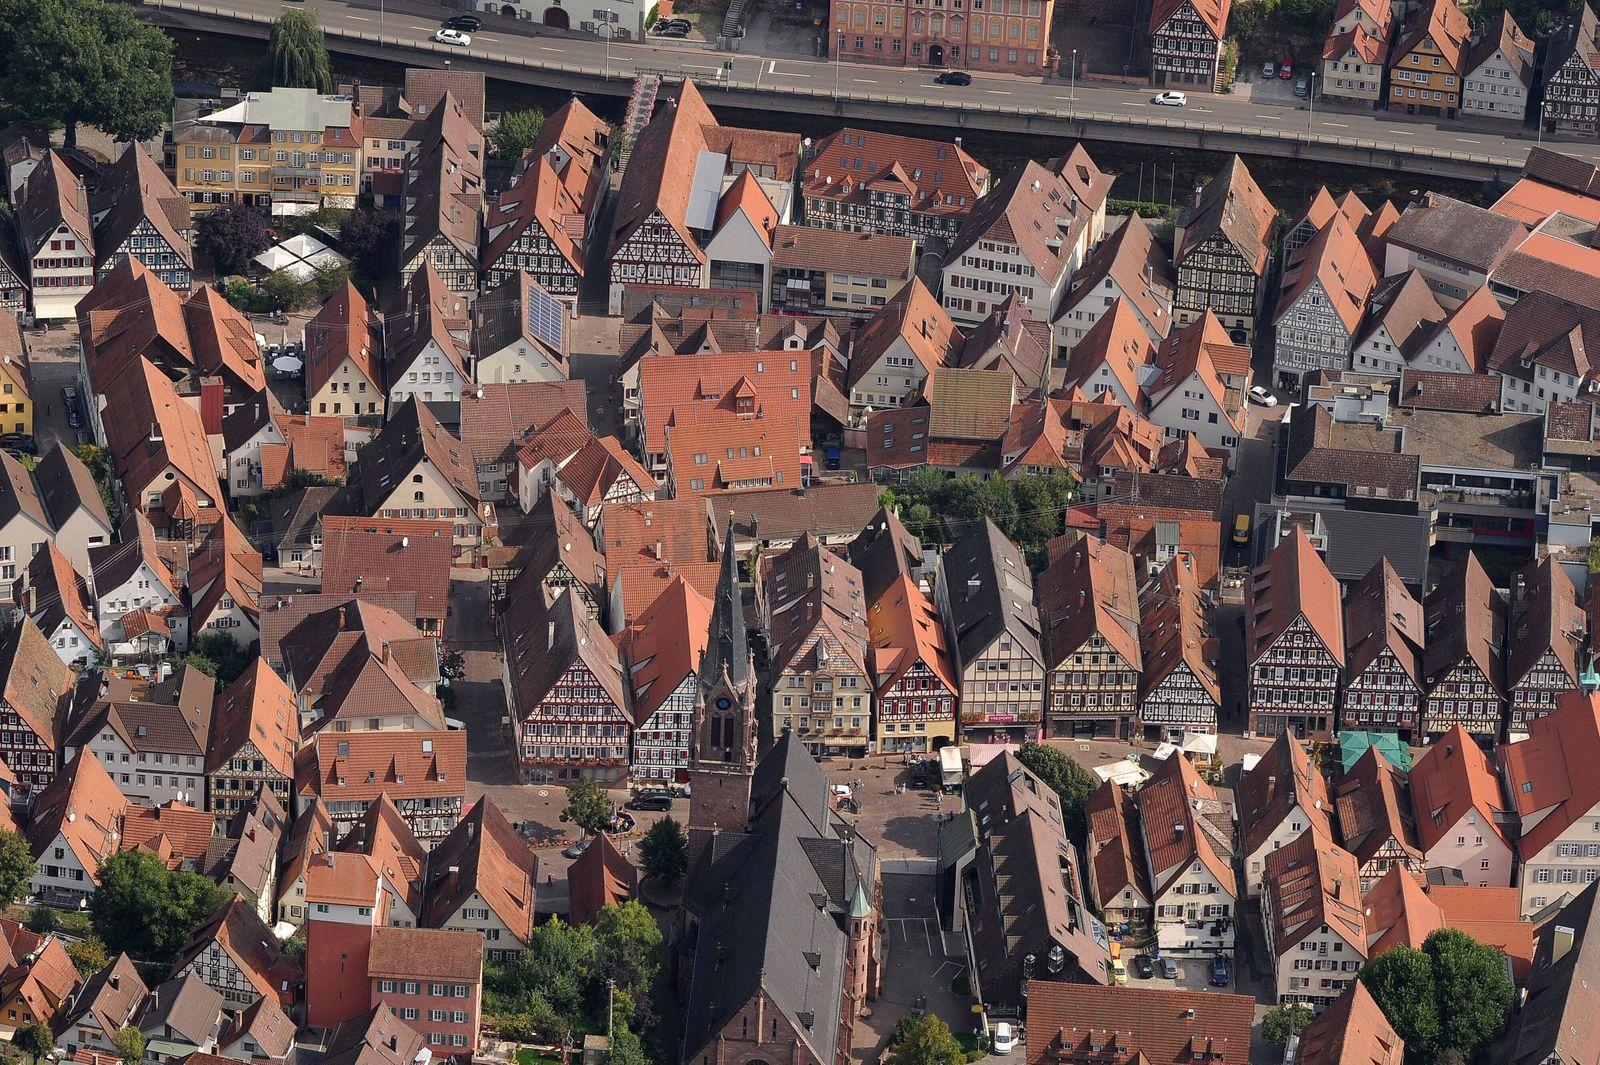 Luft Luftbild Calw Altstadt Luft Luftbild Calw Altstadt *** air aerial view Calw old town air aerial view Calw old town